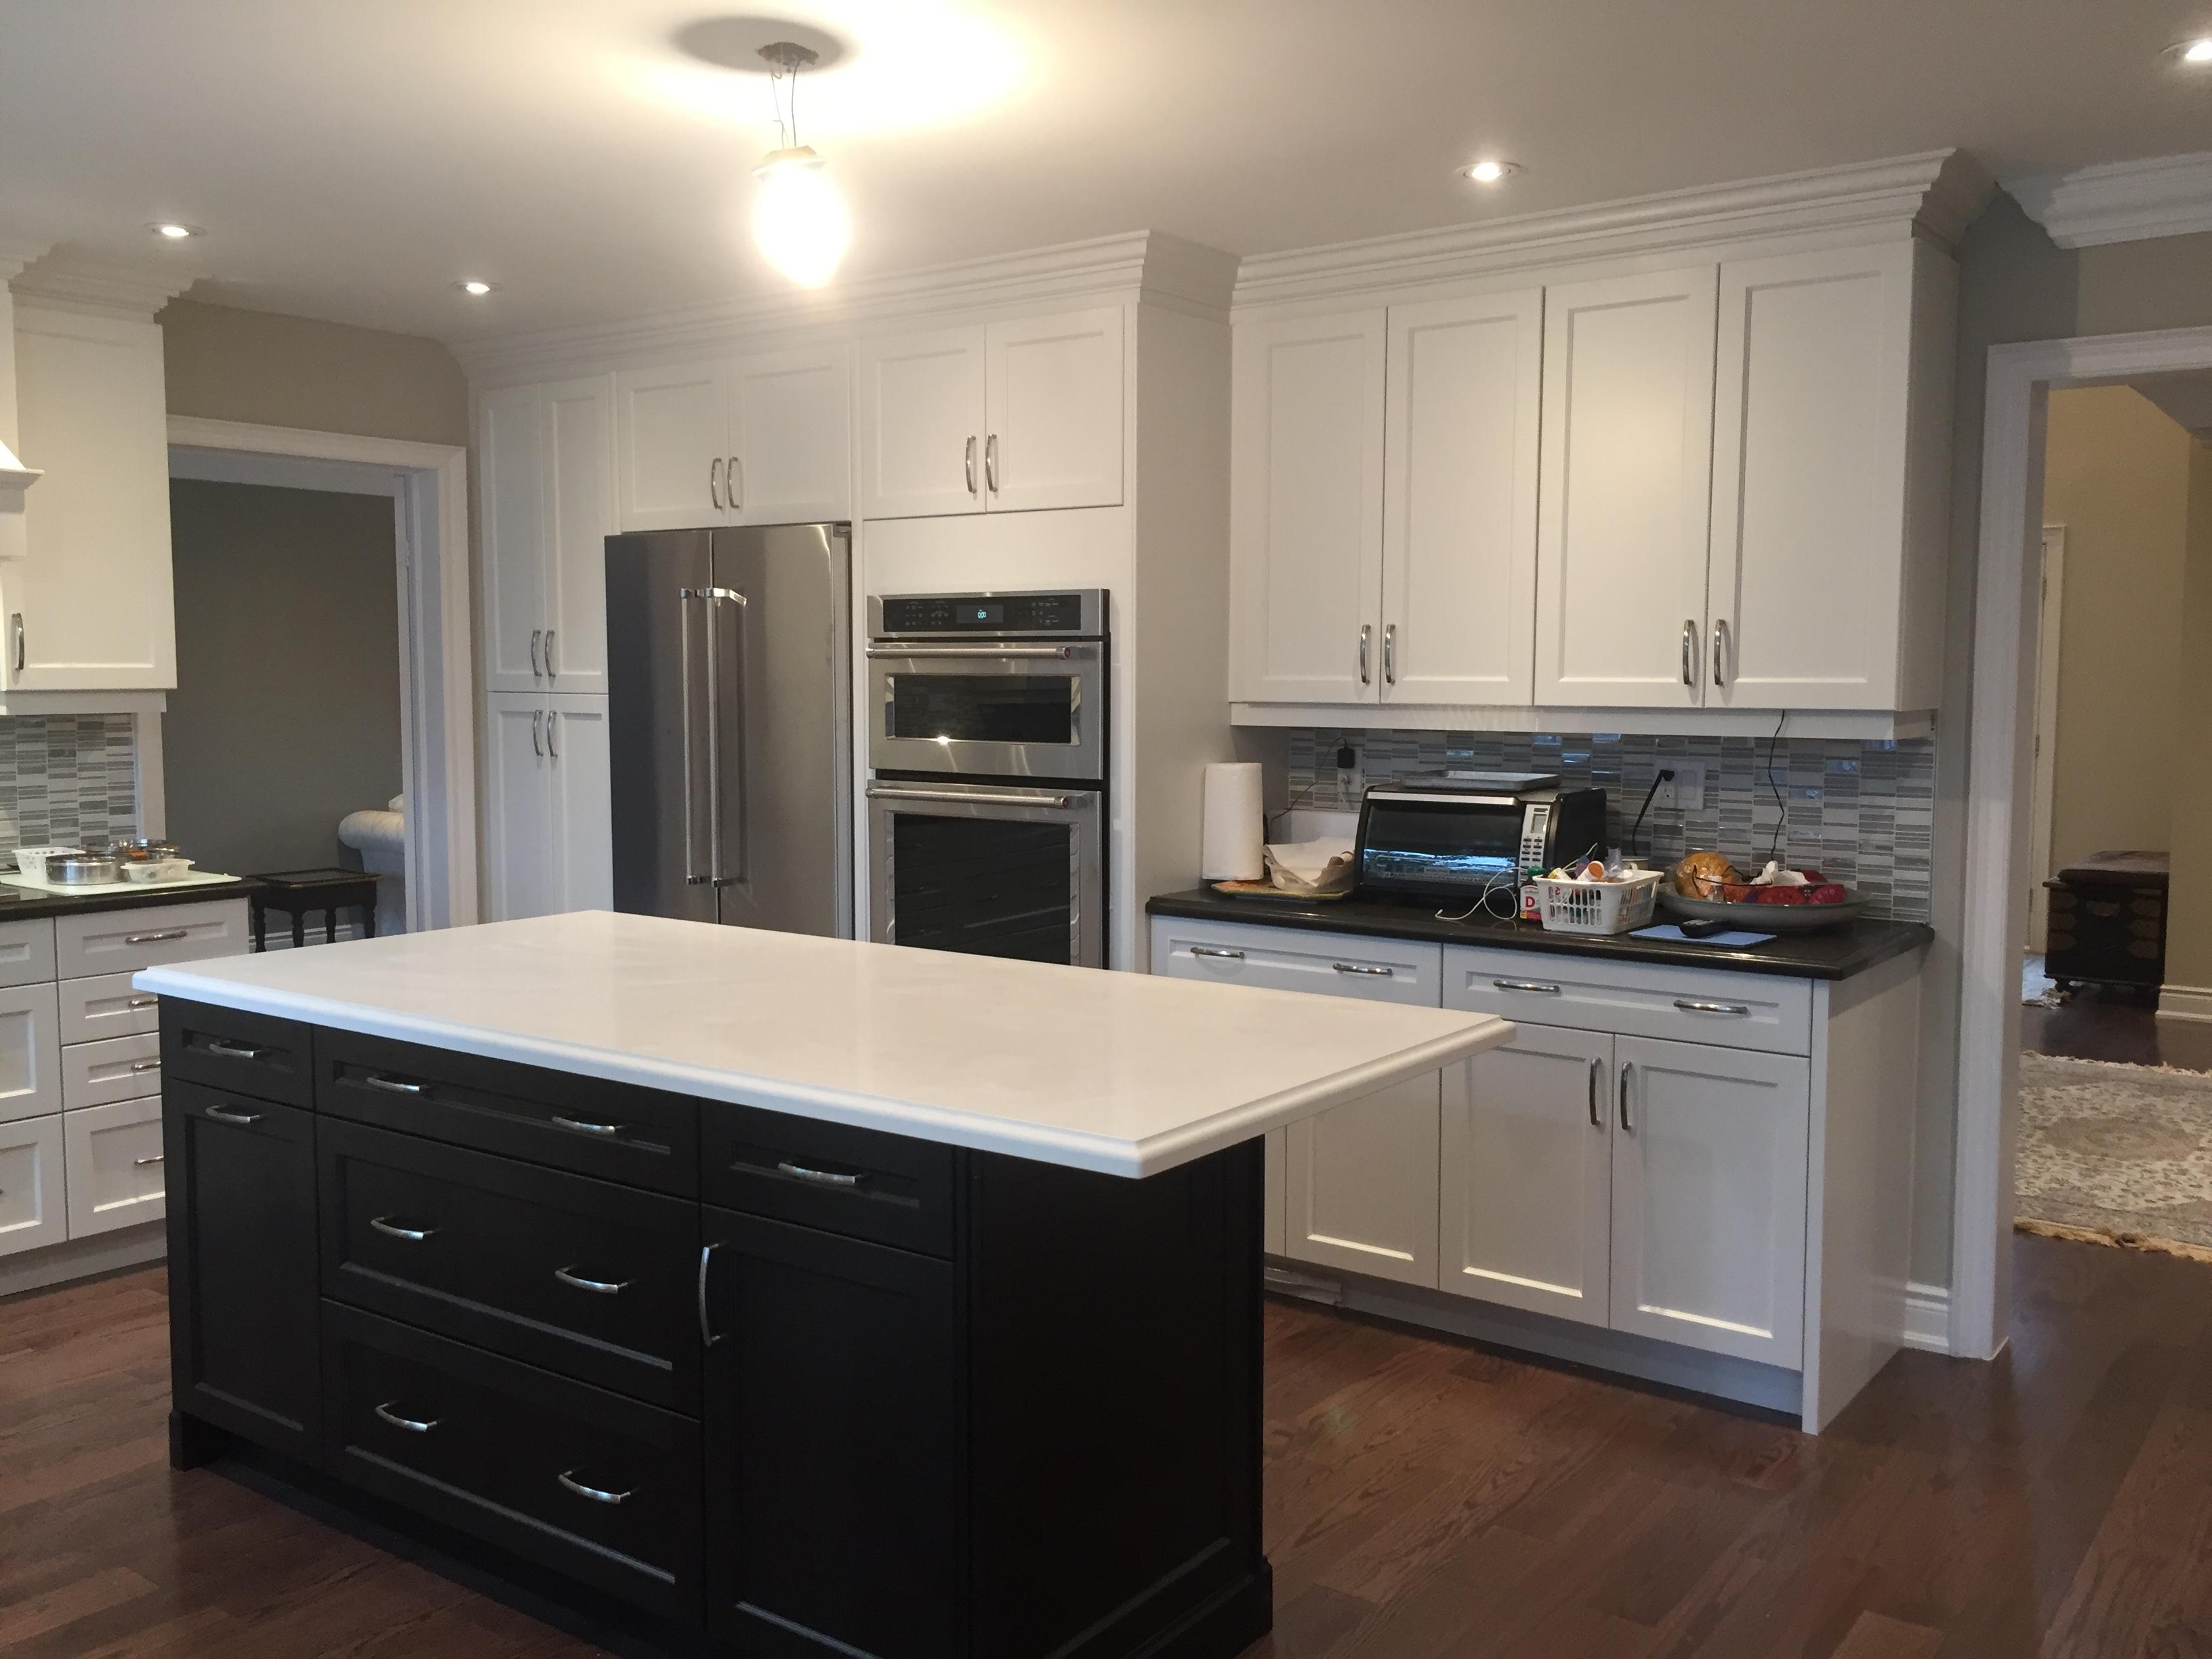 Kitchen, Badminton Rd